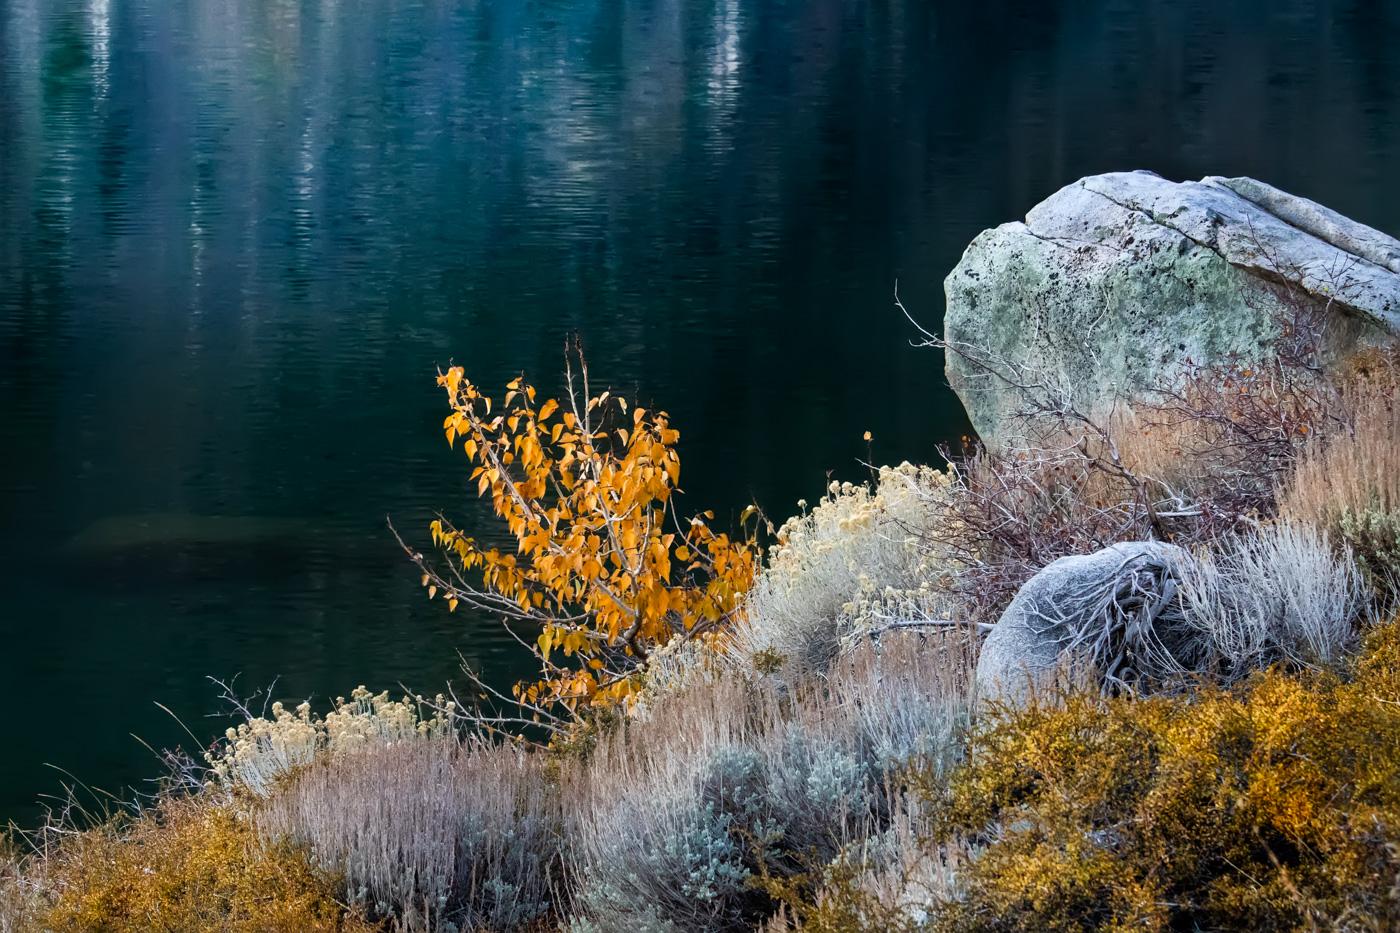 Convict Lake Shore - Eastern Sierra - Autumn Vegetation